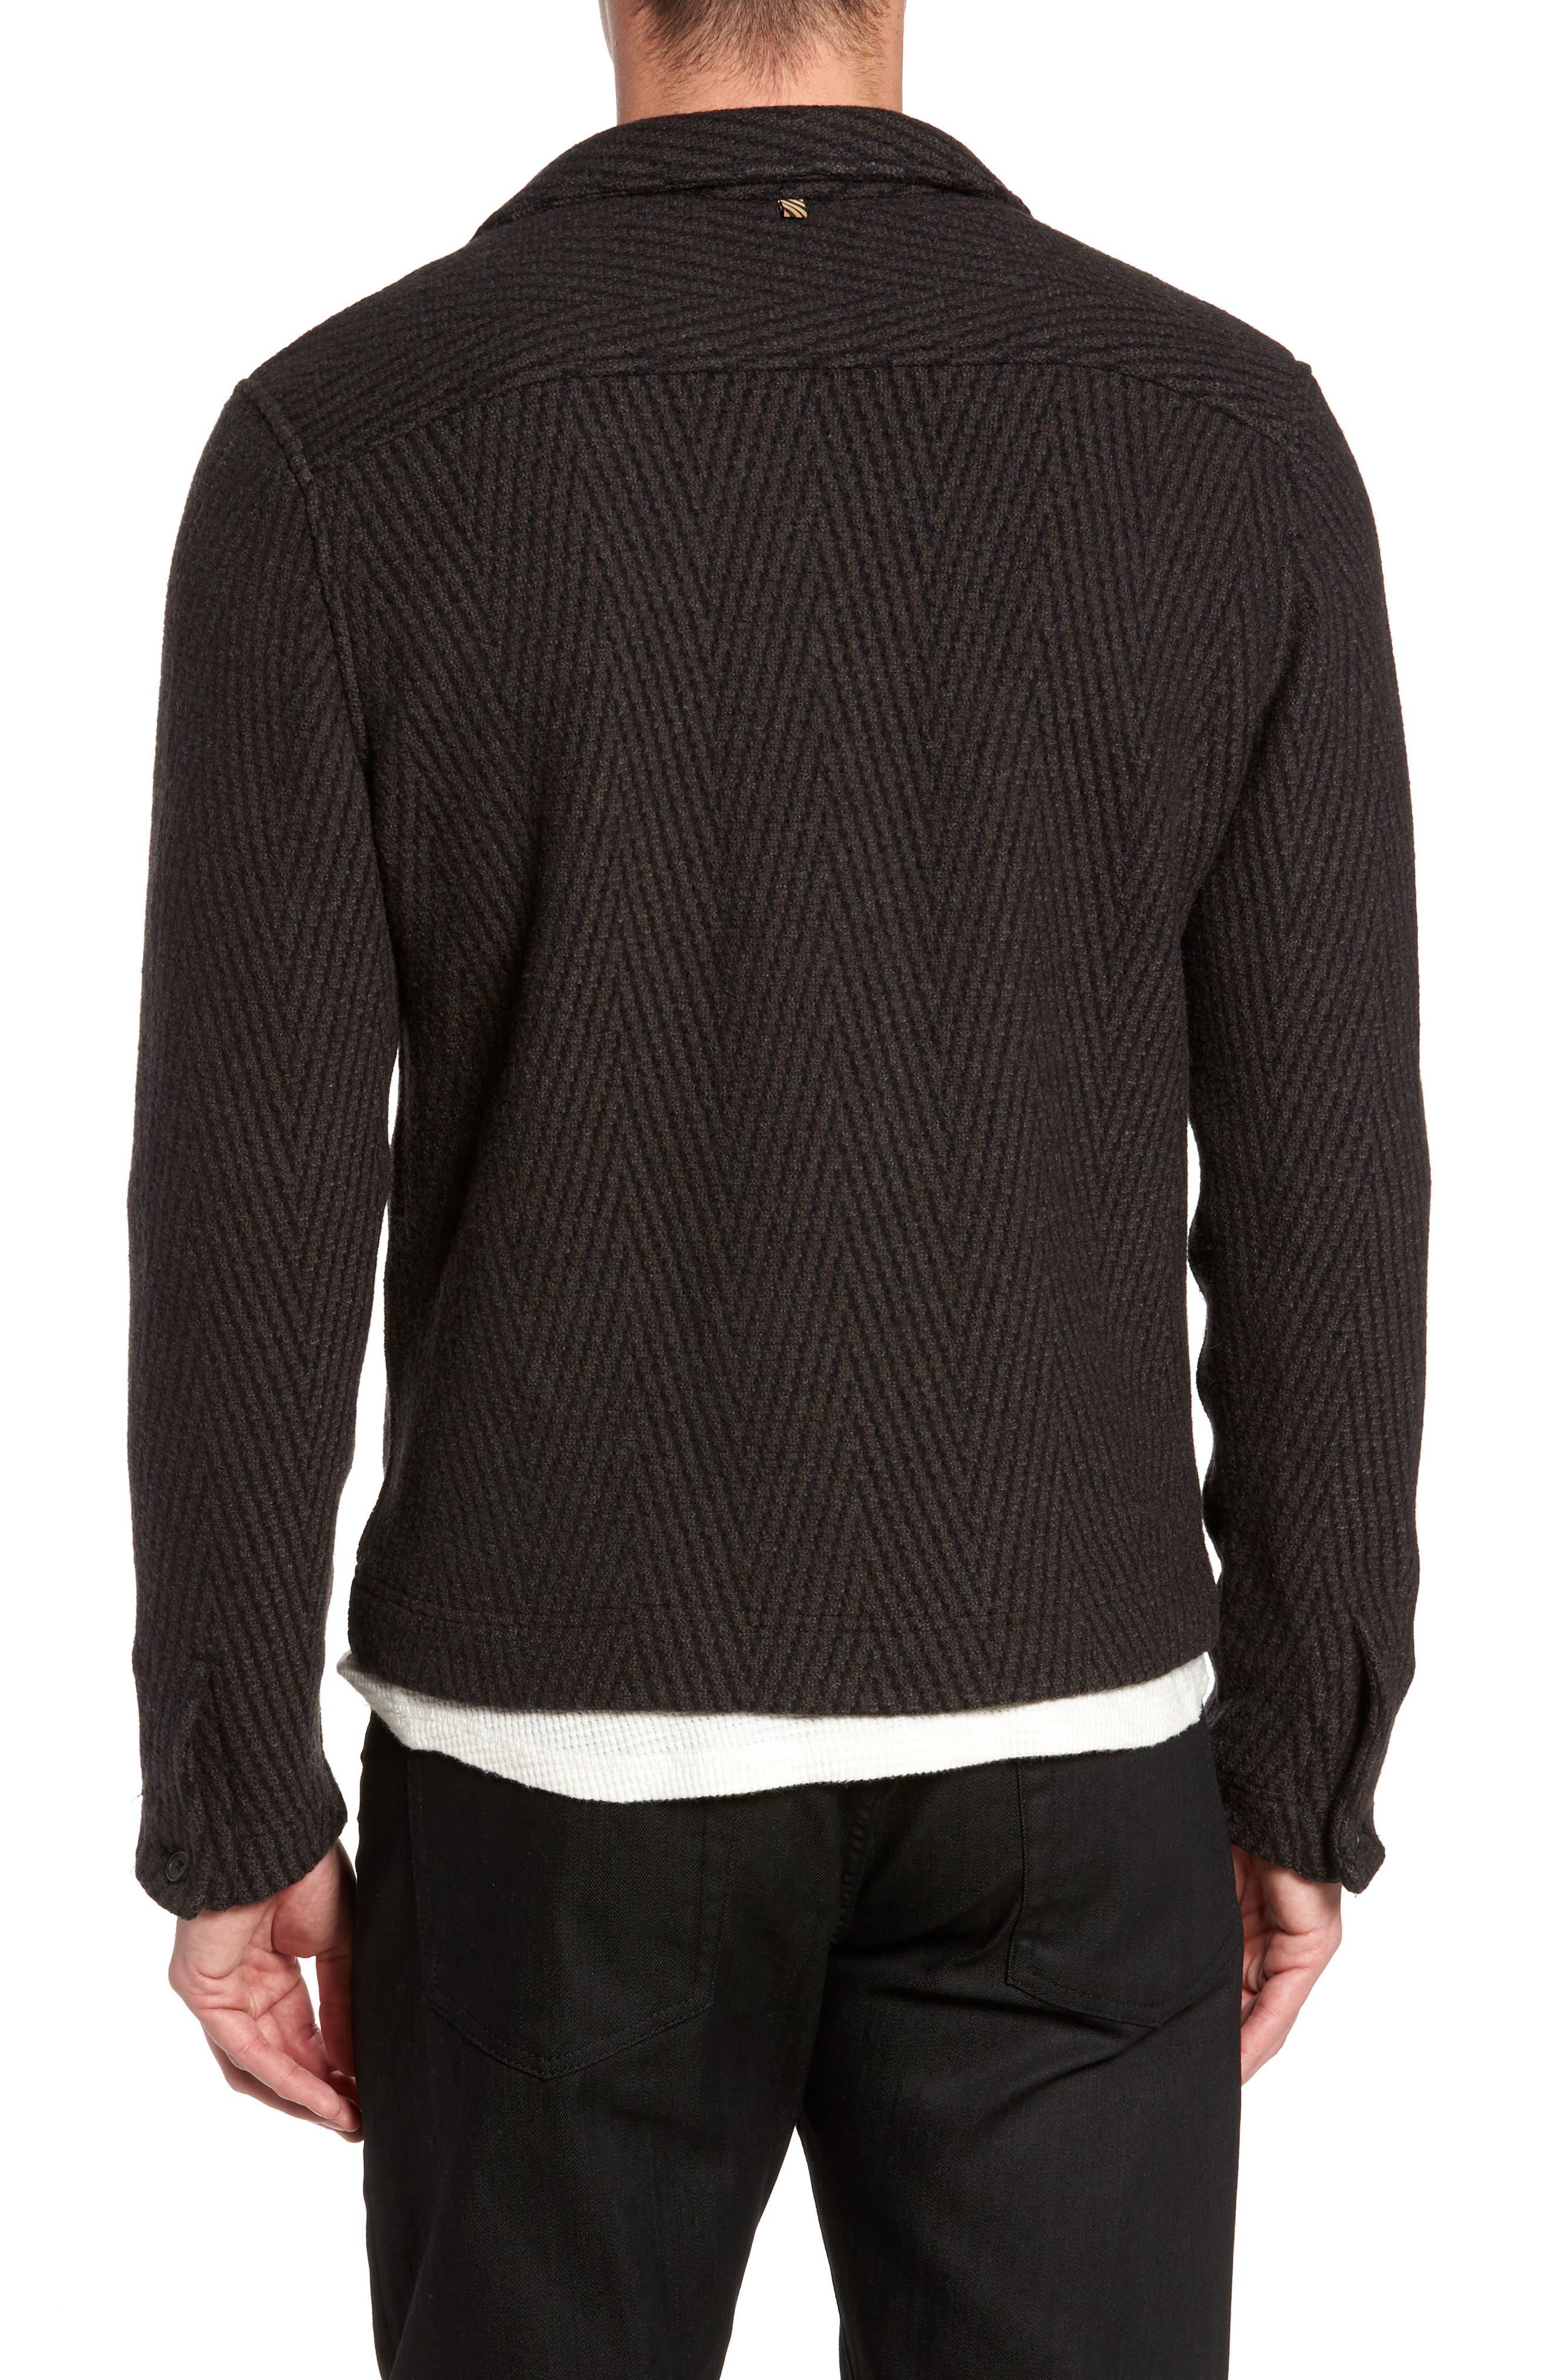 Berger Wool Shirt Jacket,                             Alternate thumbnail 2, color,                             200